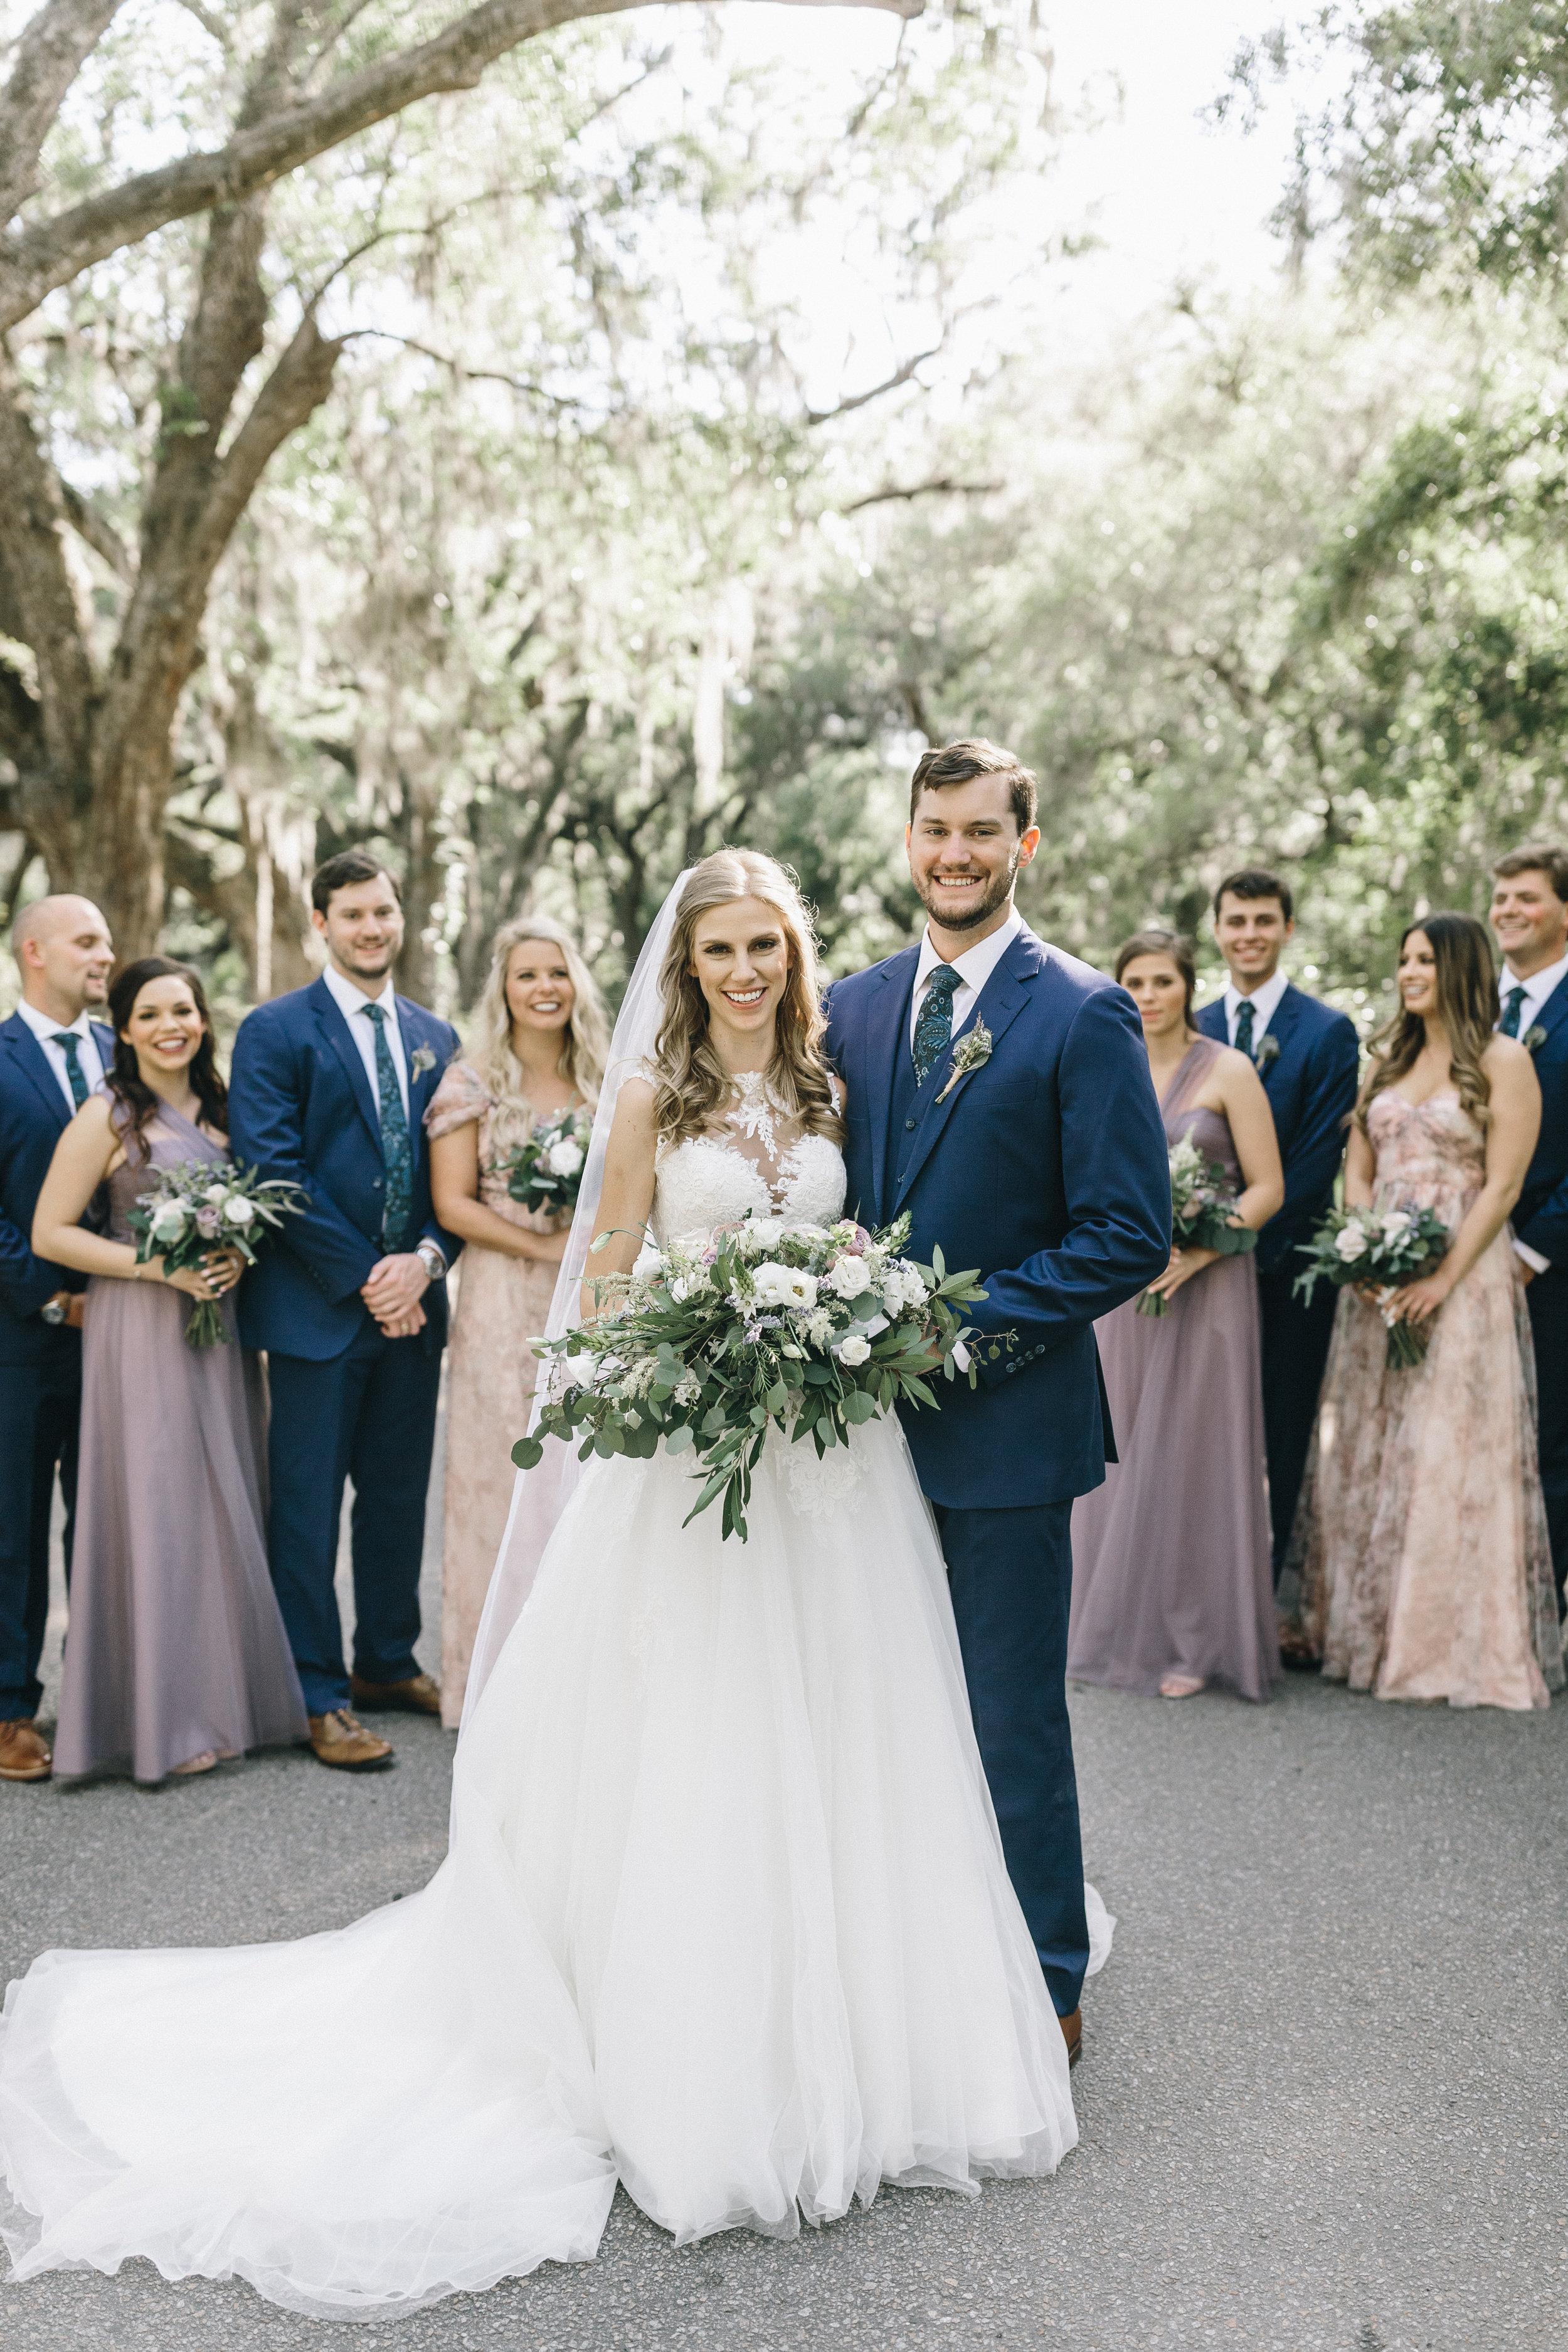 Jenna+Michael_wedding-264.jpg